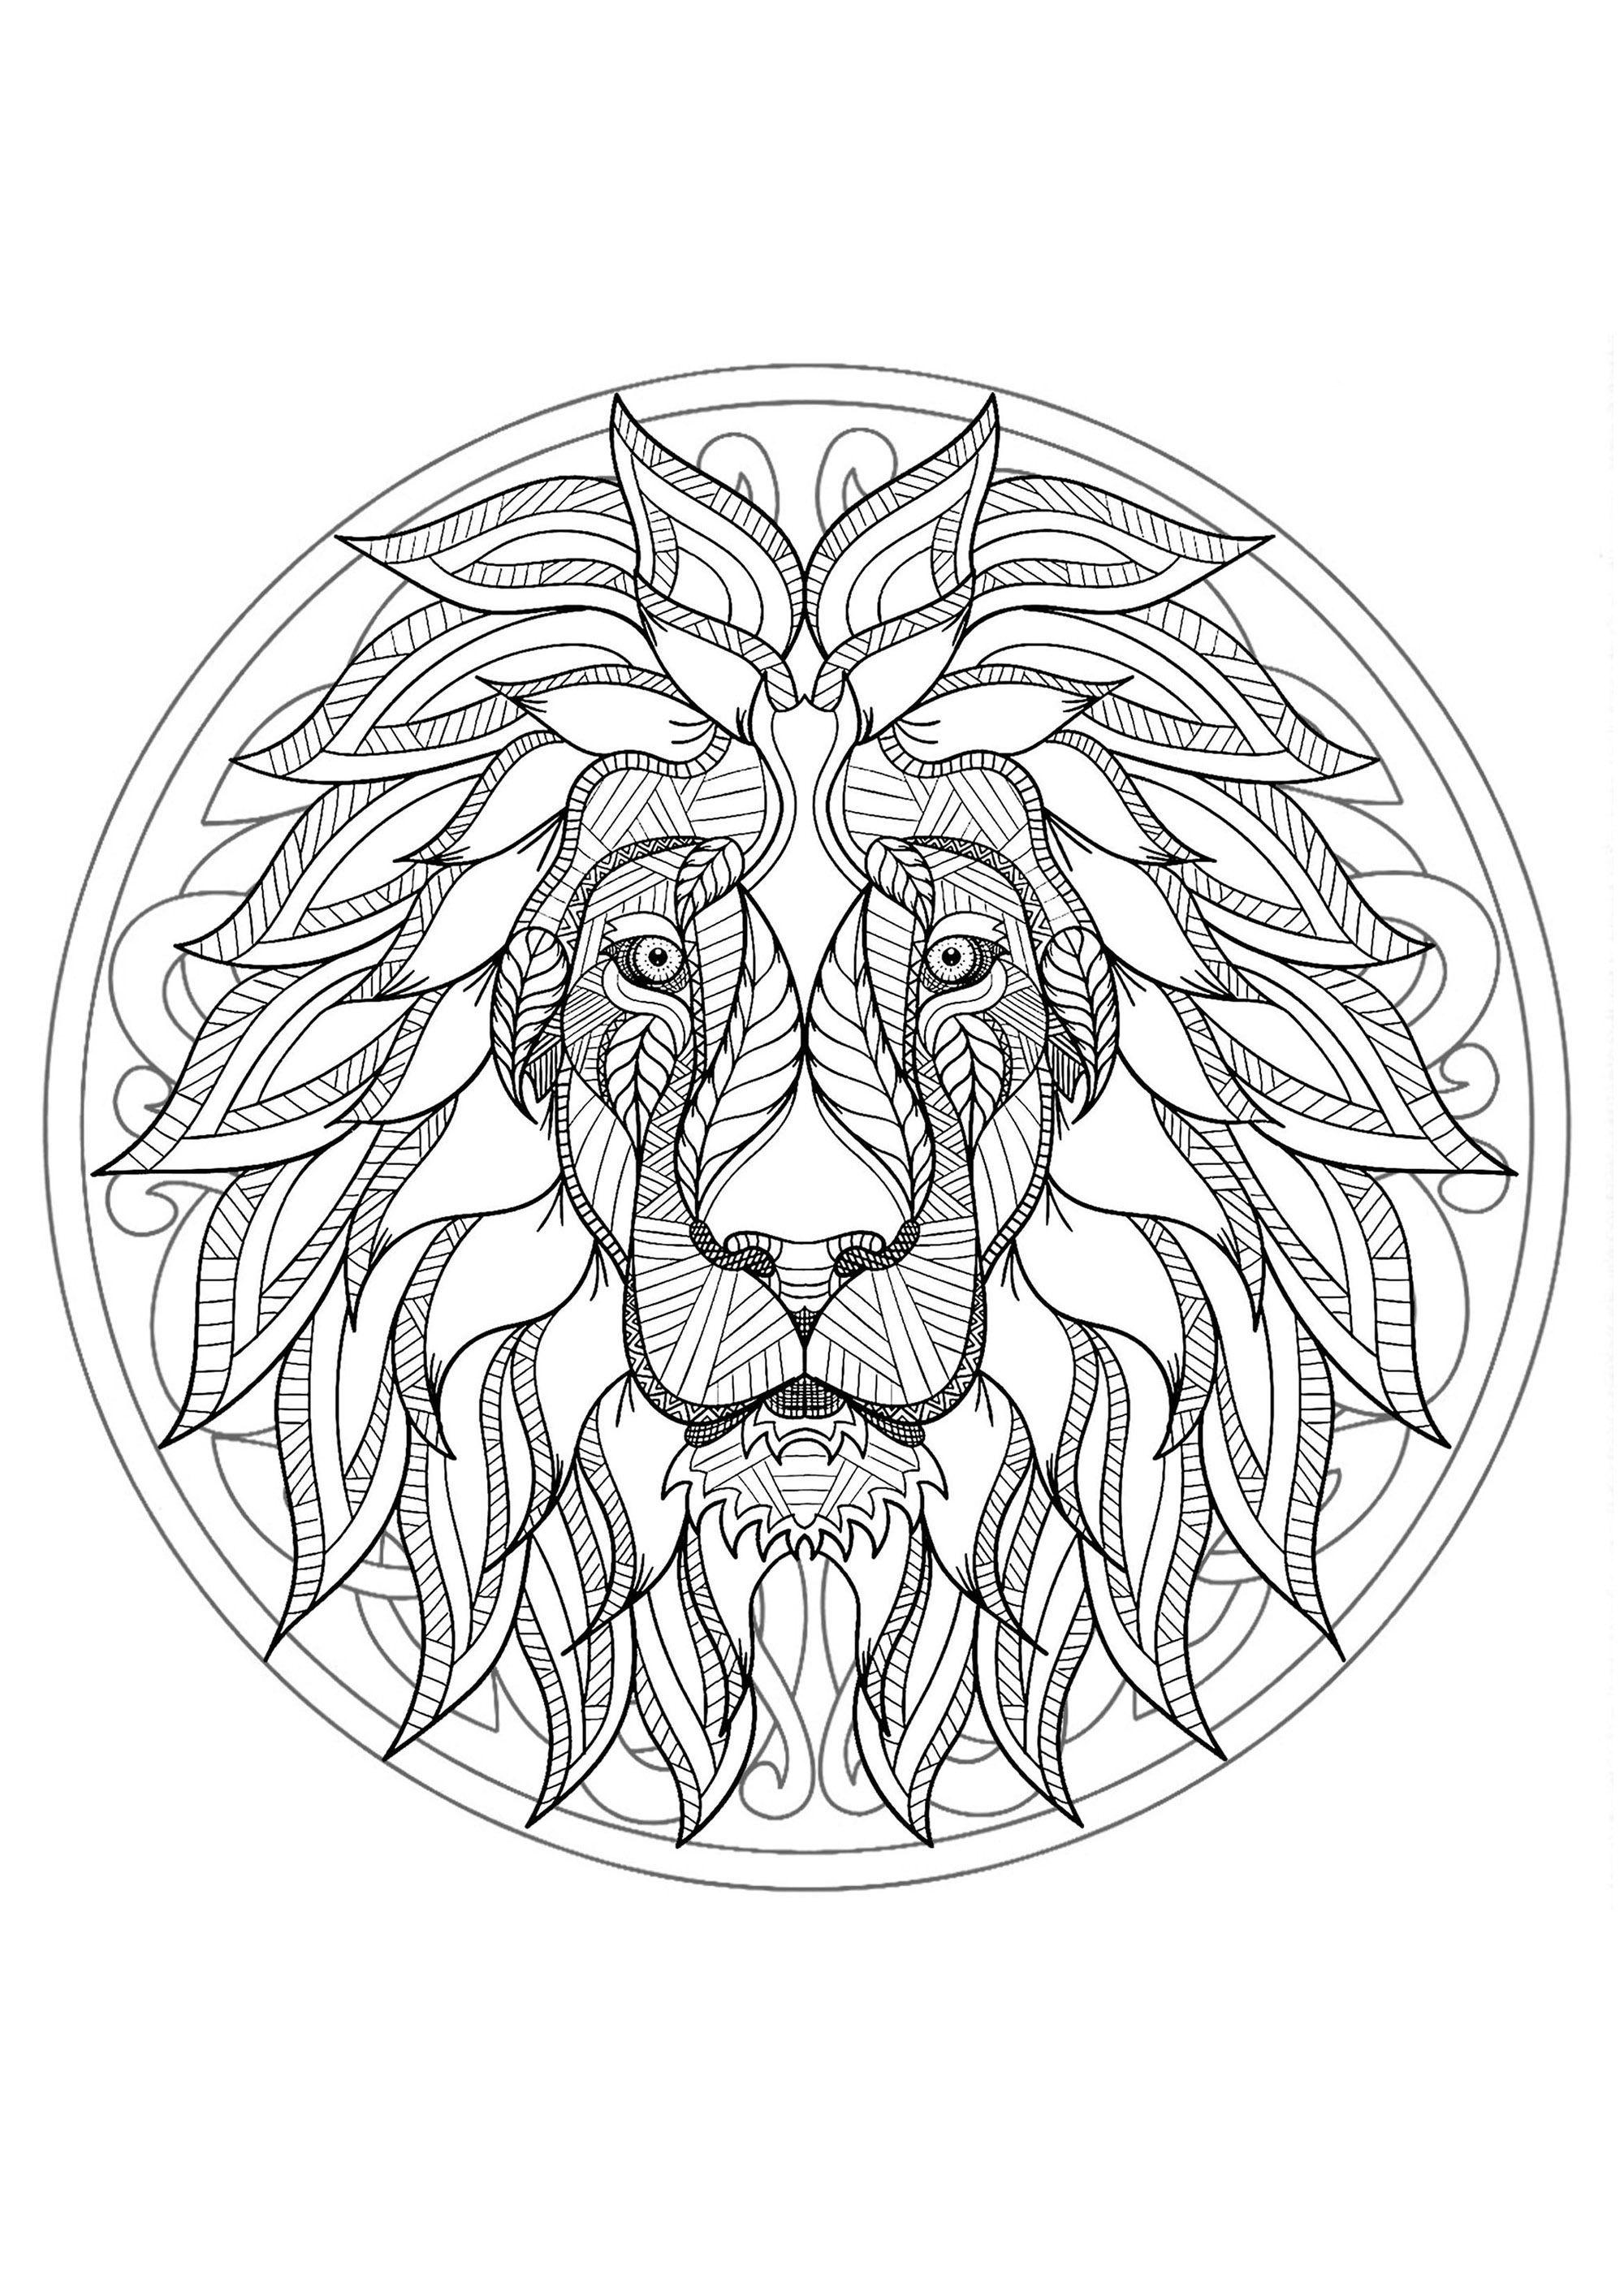 Mandala With Original Lion Head And Geometric Patterns Mandalas